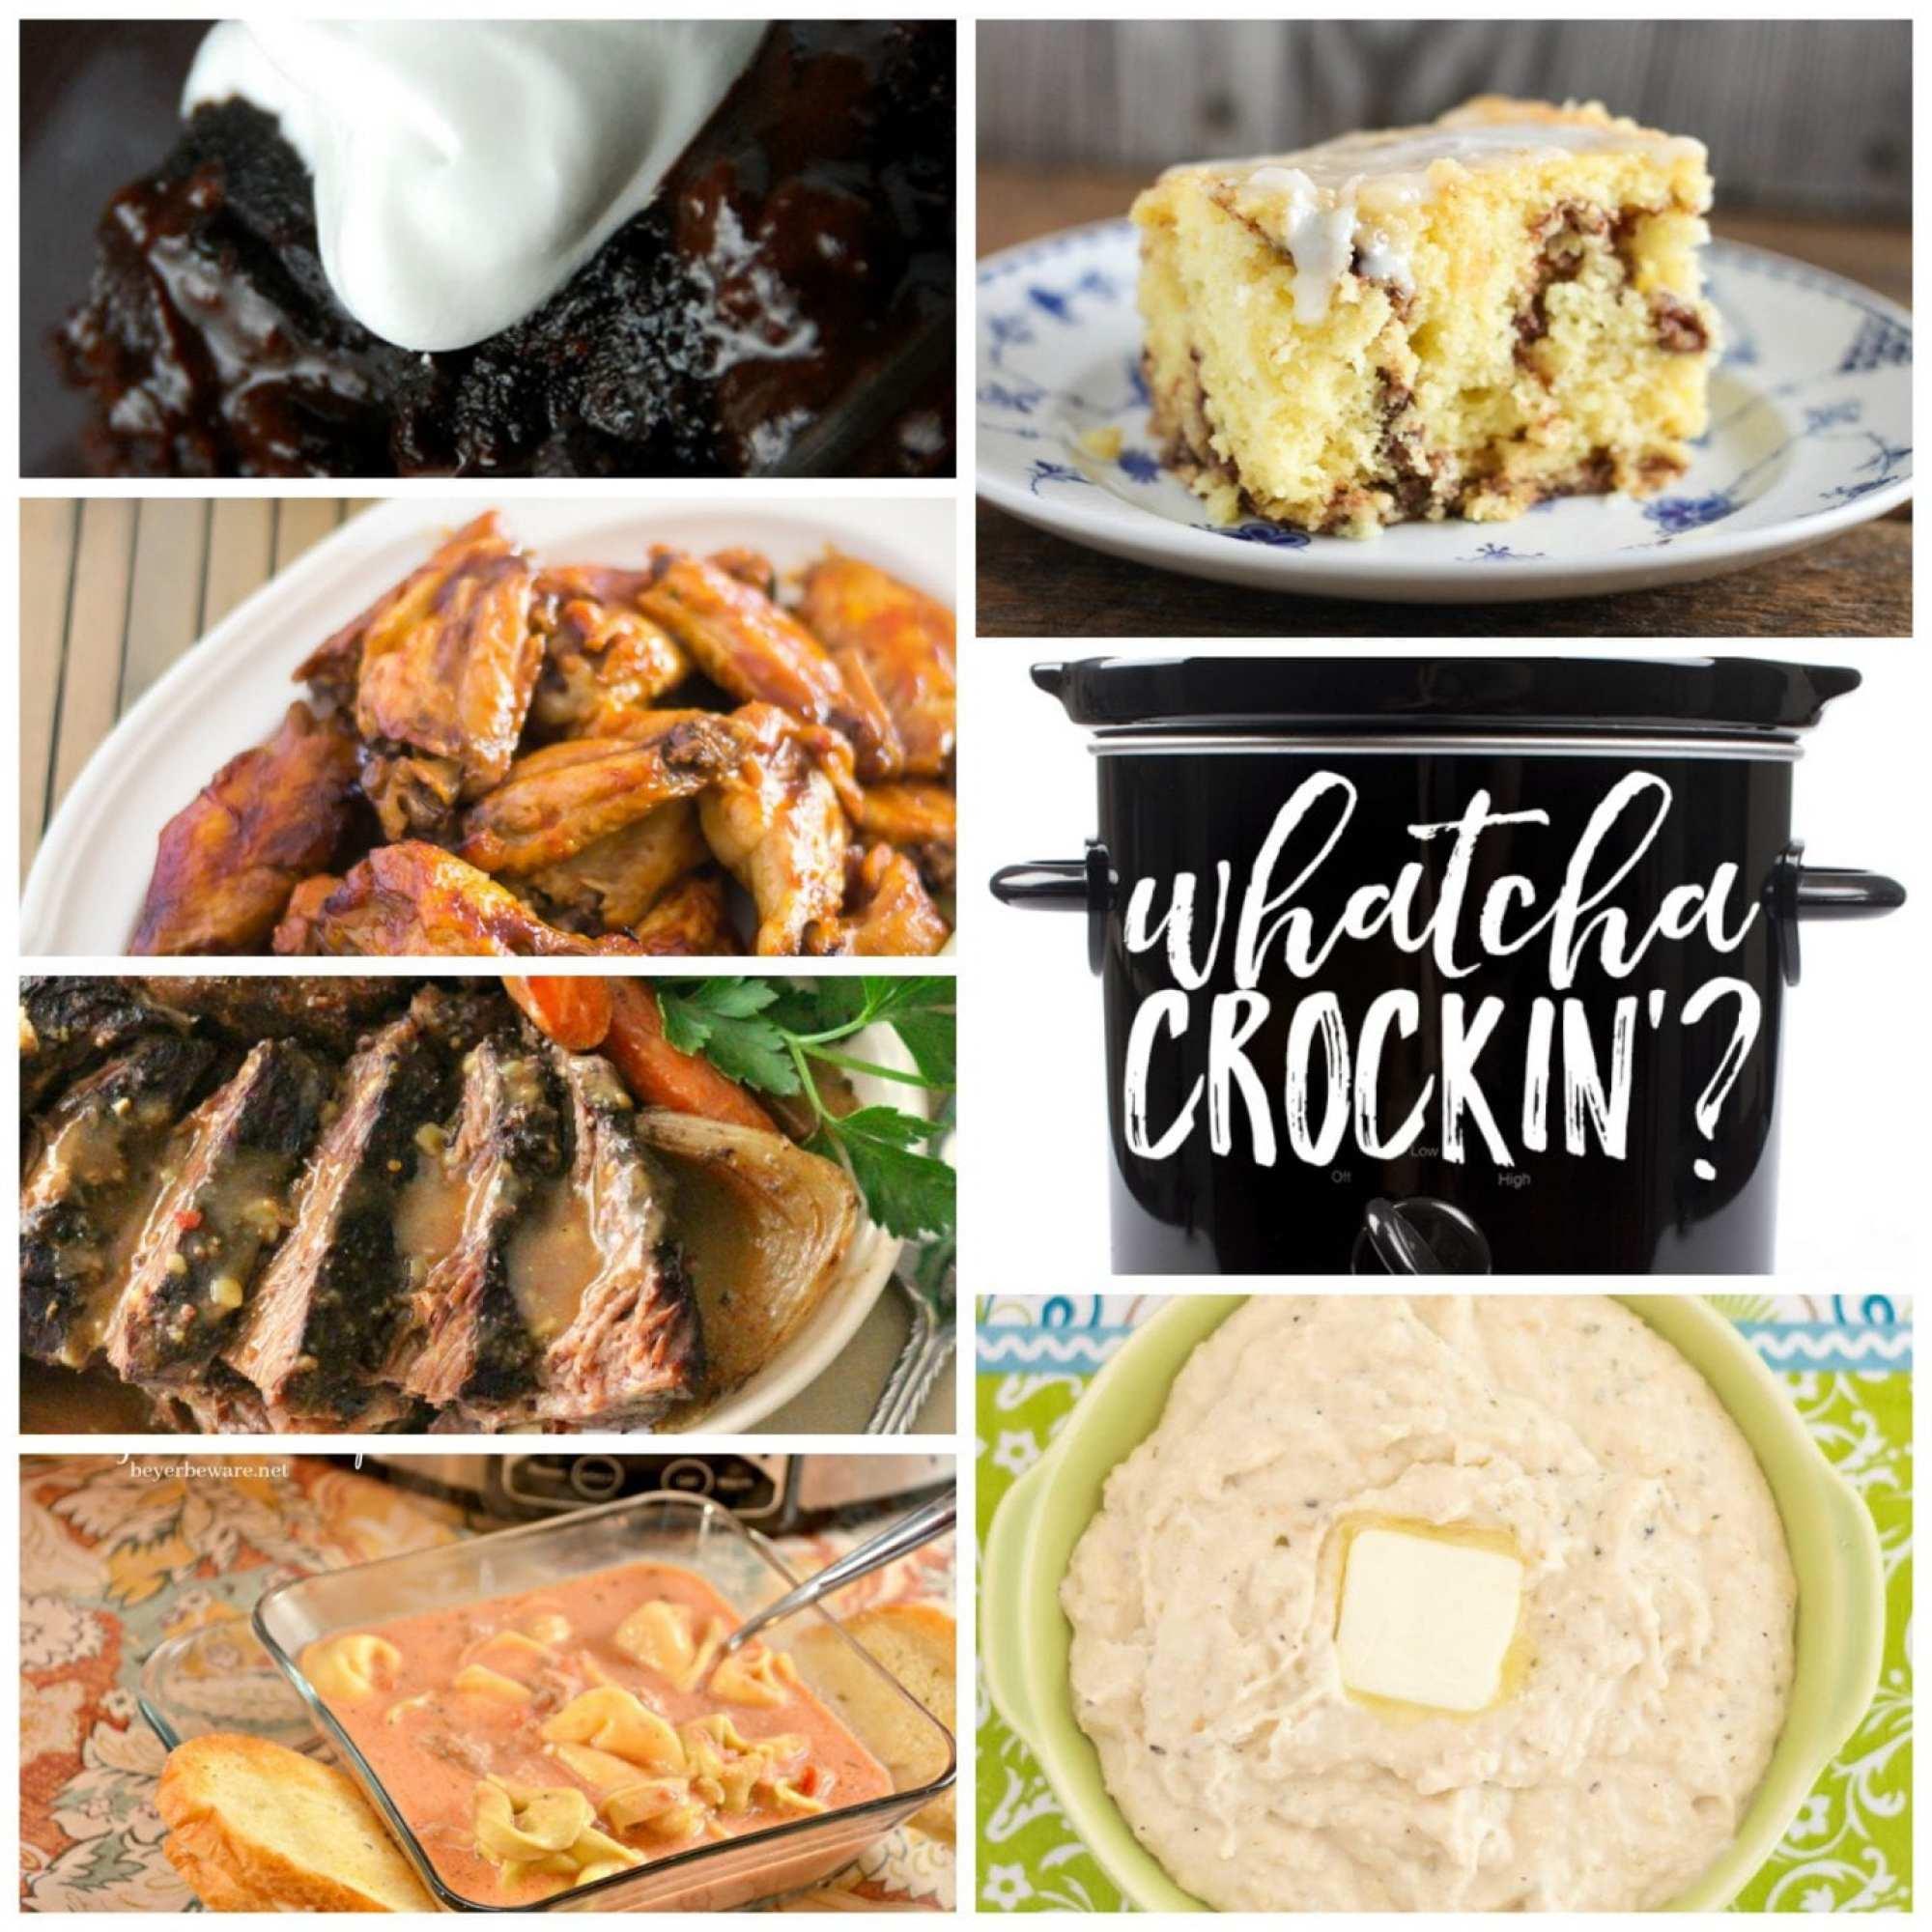 This week's Whatcha Crockin' crock pot recipes include Crock Pot Coffee Cake, Crock Pot Cheesy Buttermilk Mashed Cauliflower, Coca Cola Pot Roast, Crock Pot Hot Fudge Brownies, Crock Pot Sausage Tortellini Soup, Crock Pot Honey BBQ Buffalo Chicken Wings and much more!